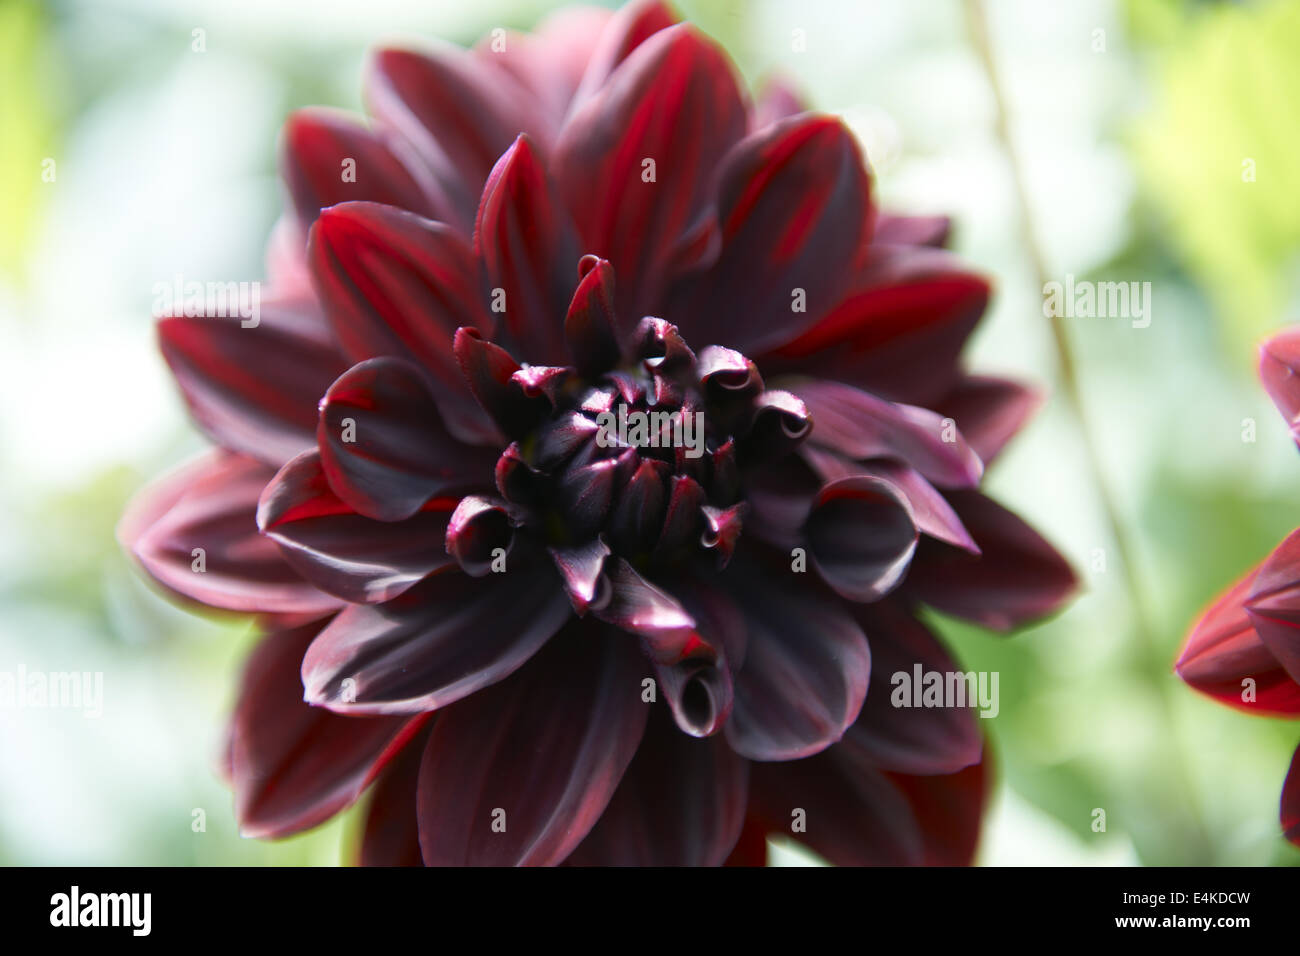 Black dahlia stock photos black dahlia stock images alamy black dahlia stock image izmirmasajfo